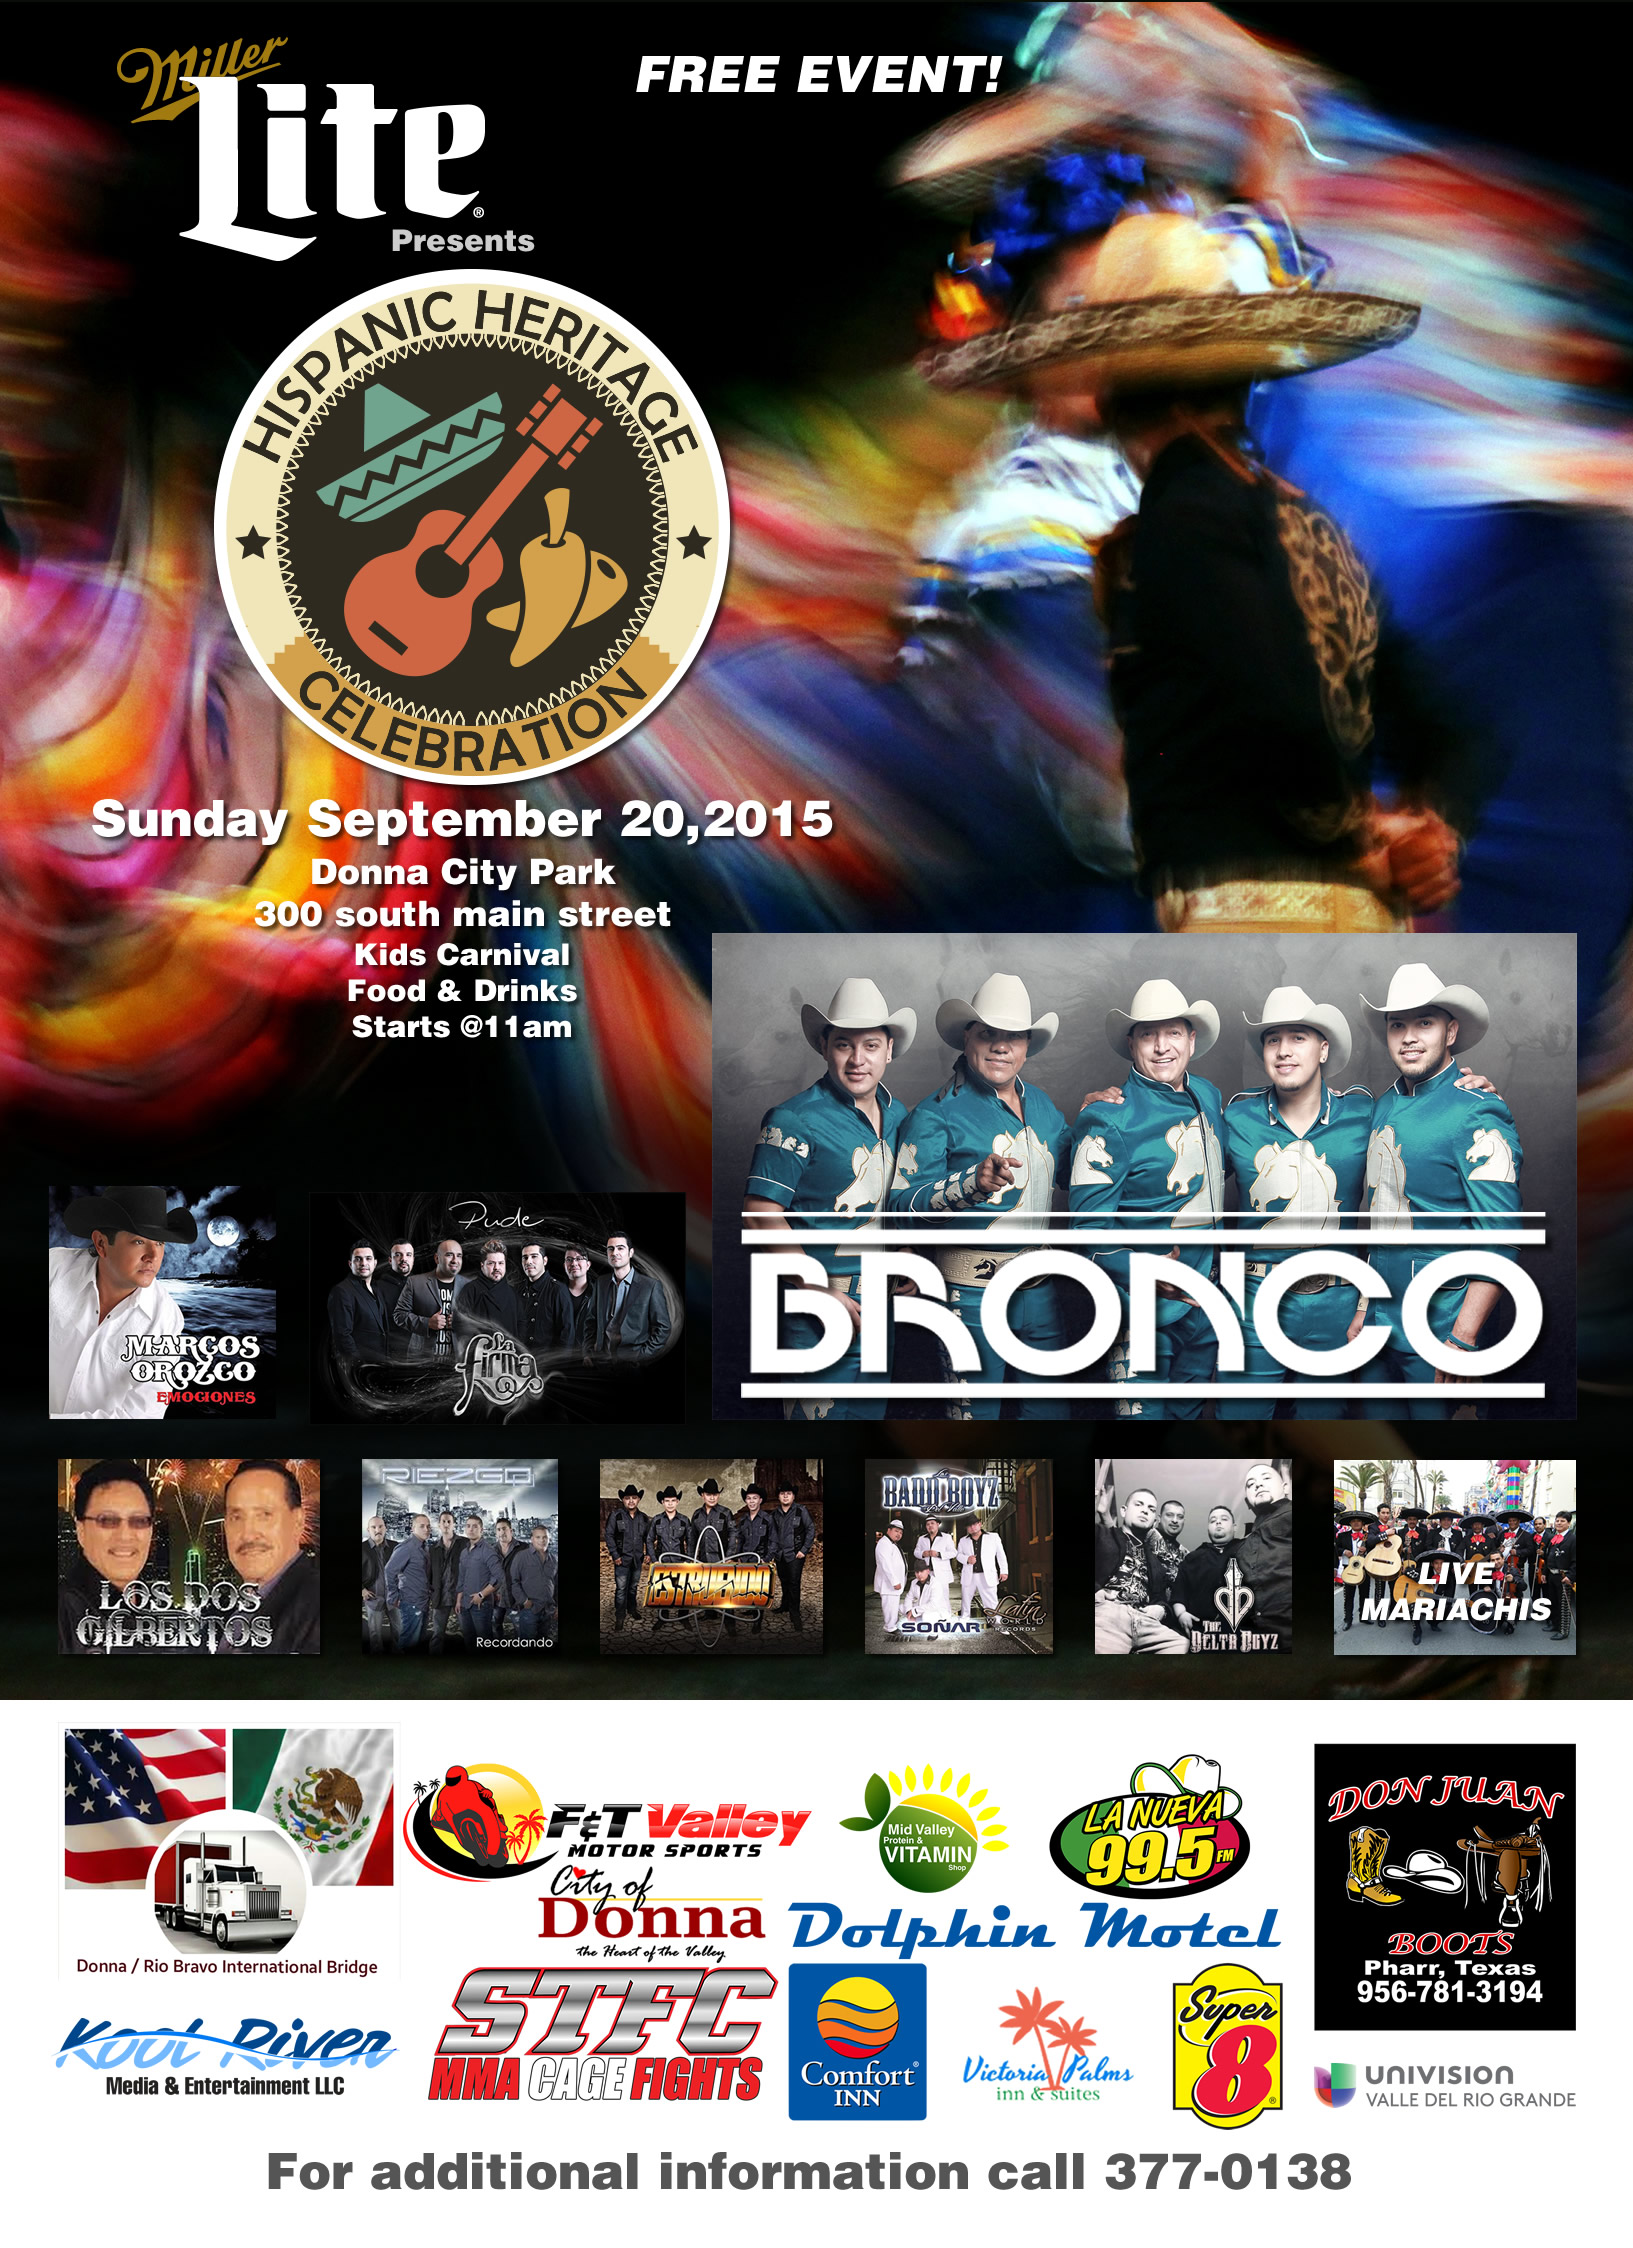 Hispanic Heritage Celebration Featuring BRONCO!